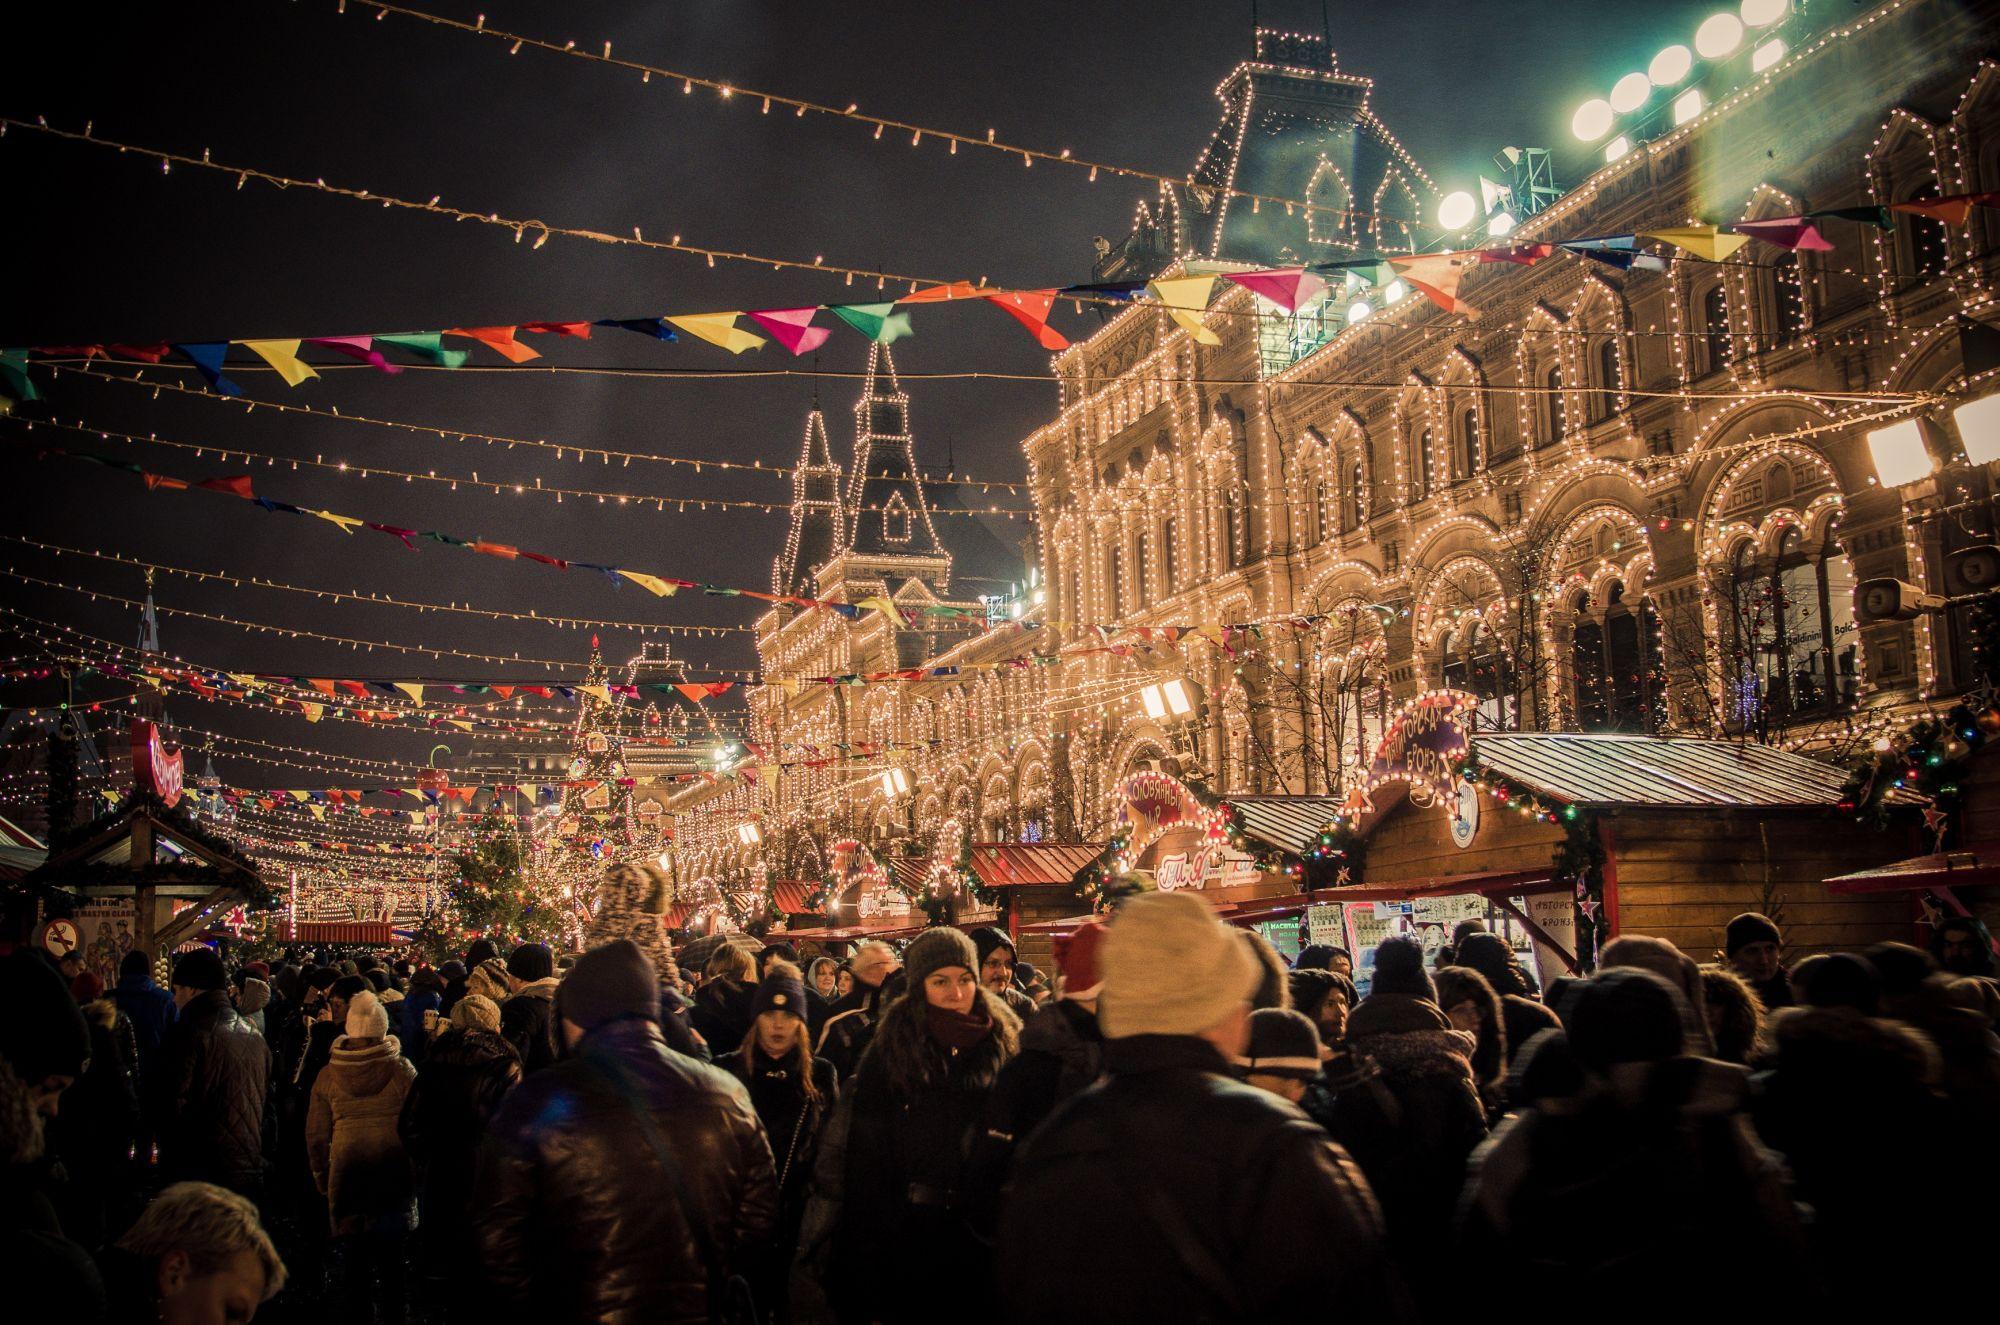 Tatler 10: The World's Best Christmas Markets